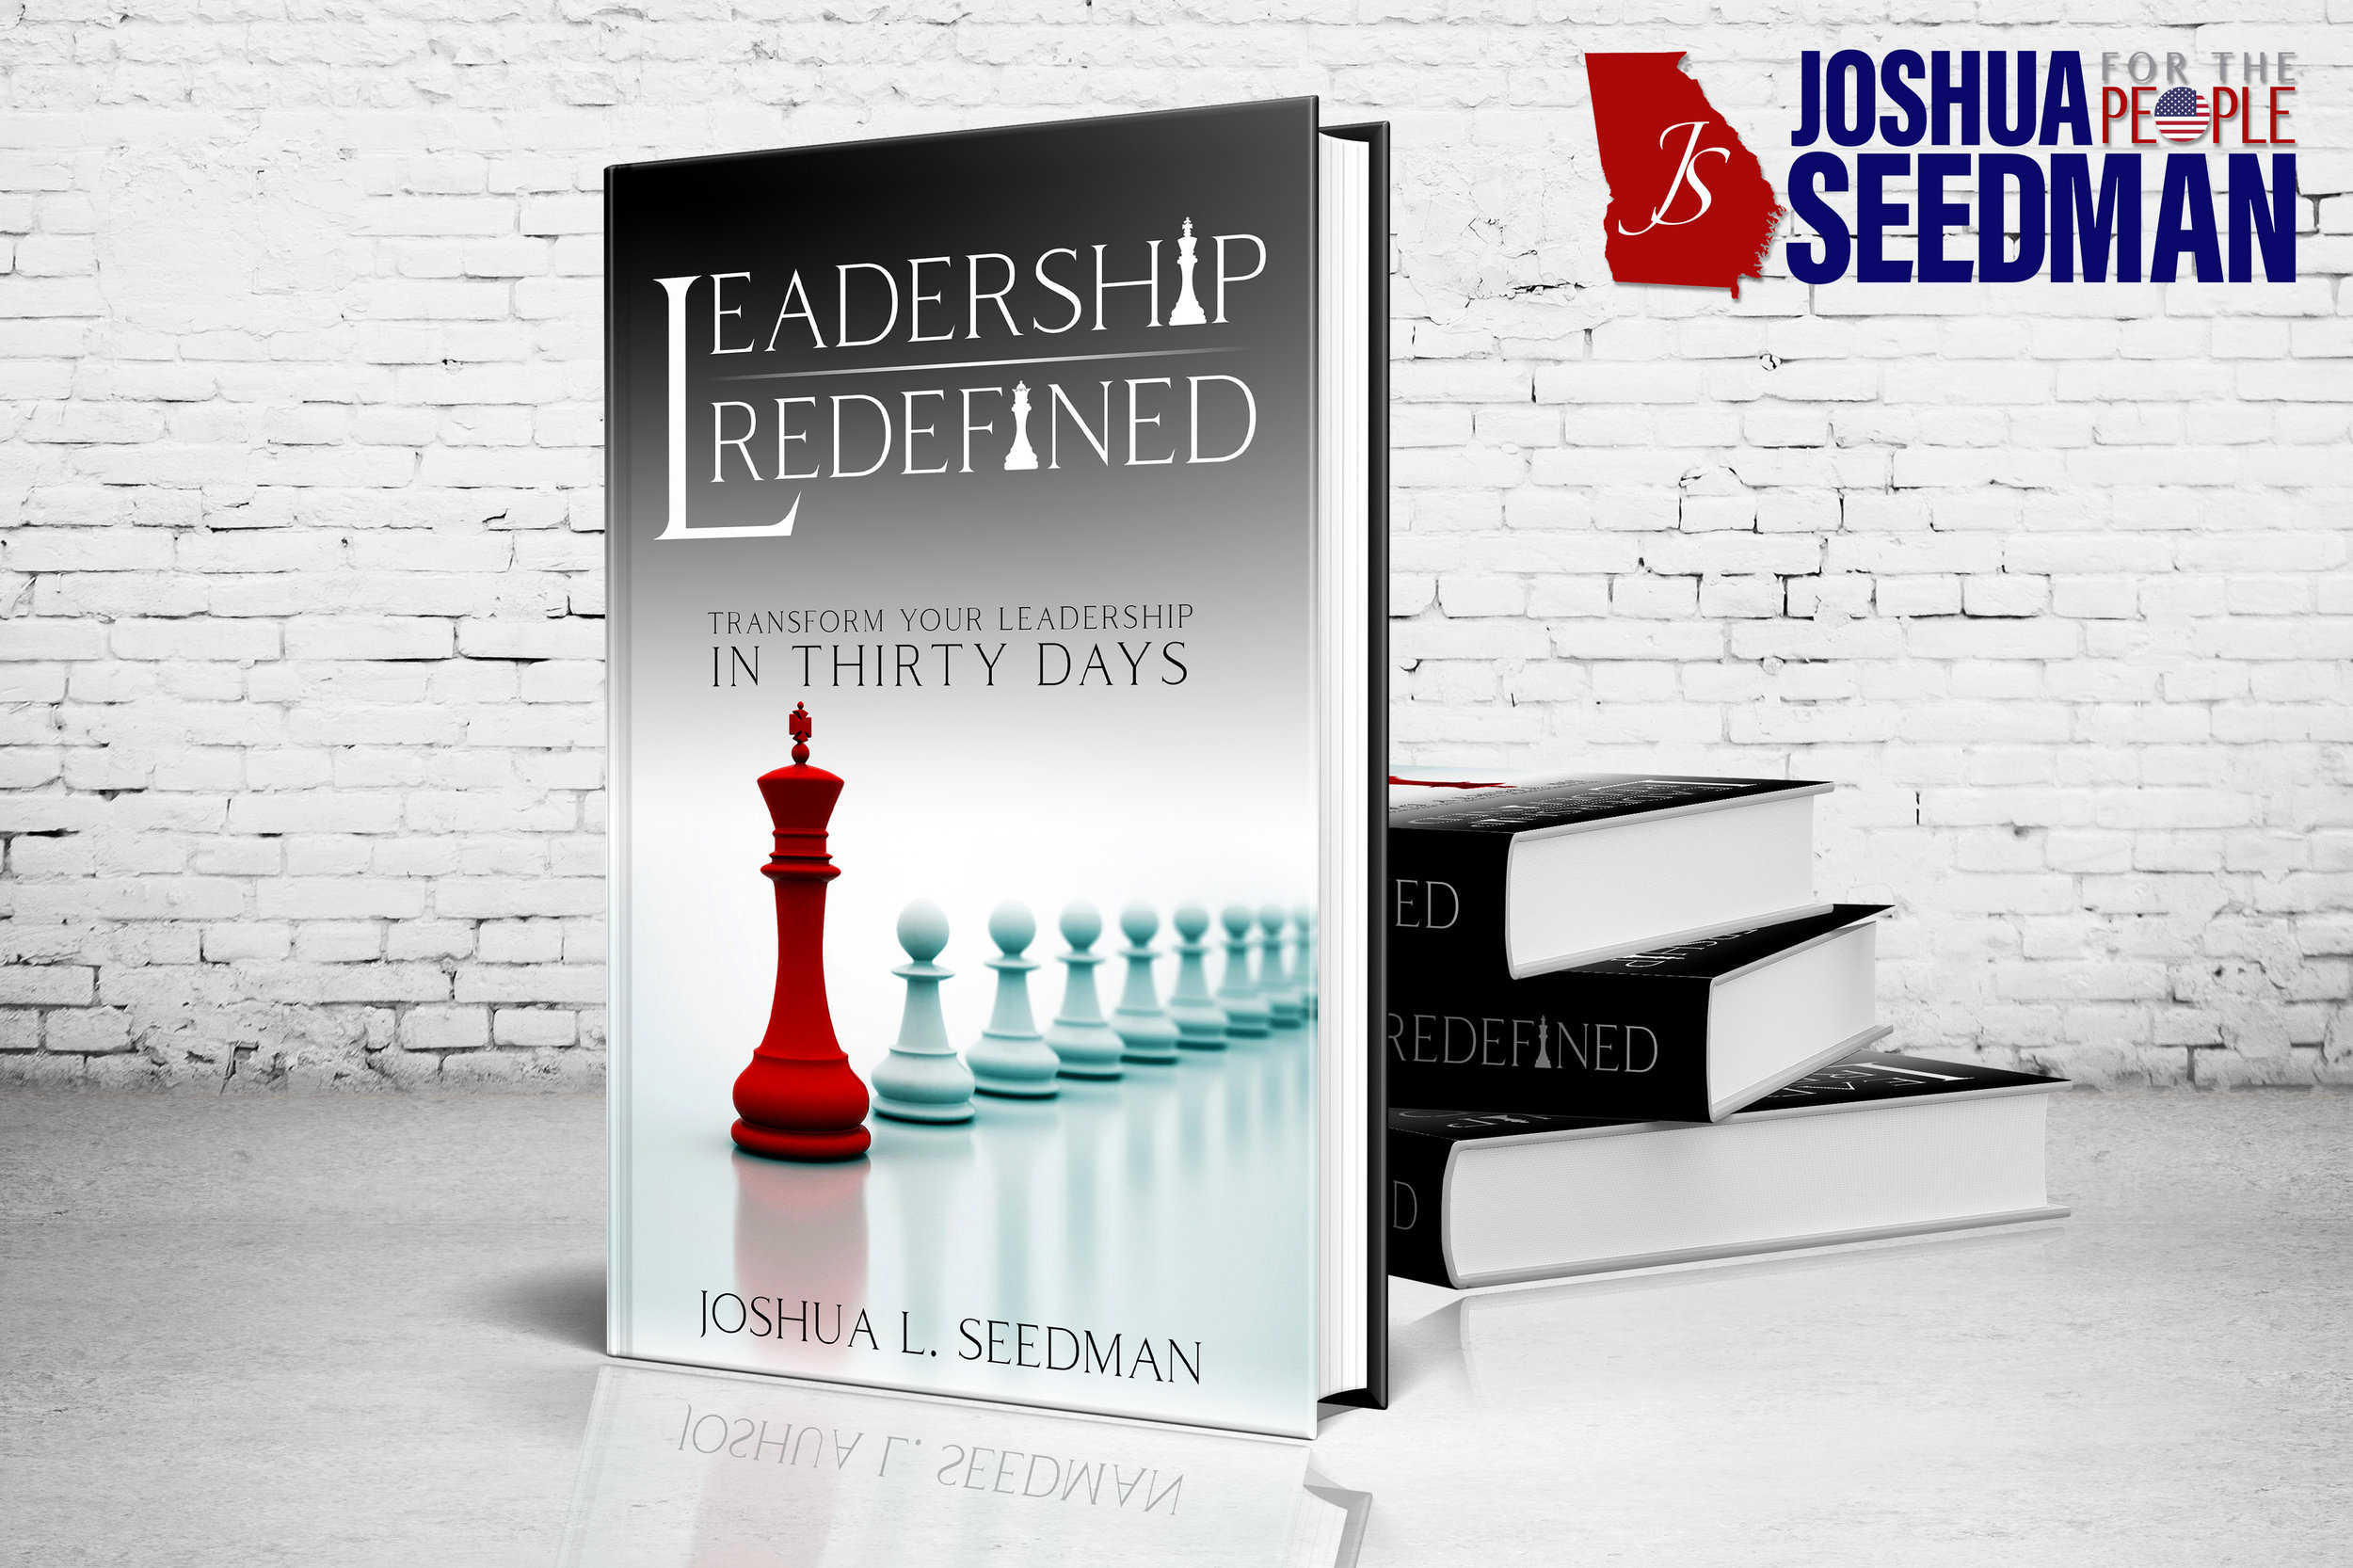 Leadership   Redefined  Joshua Seedman Published Book